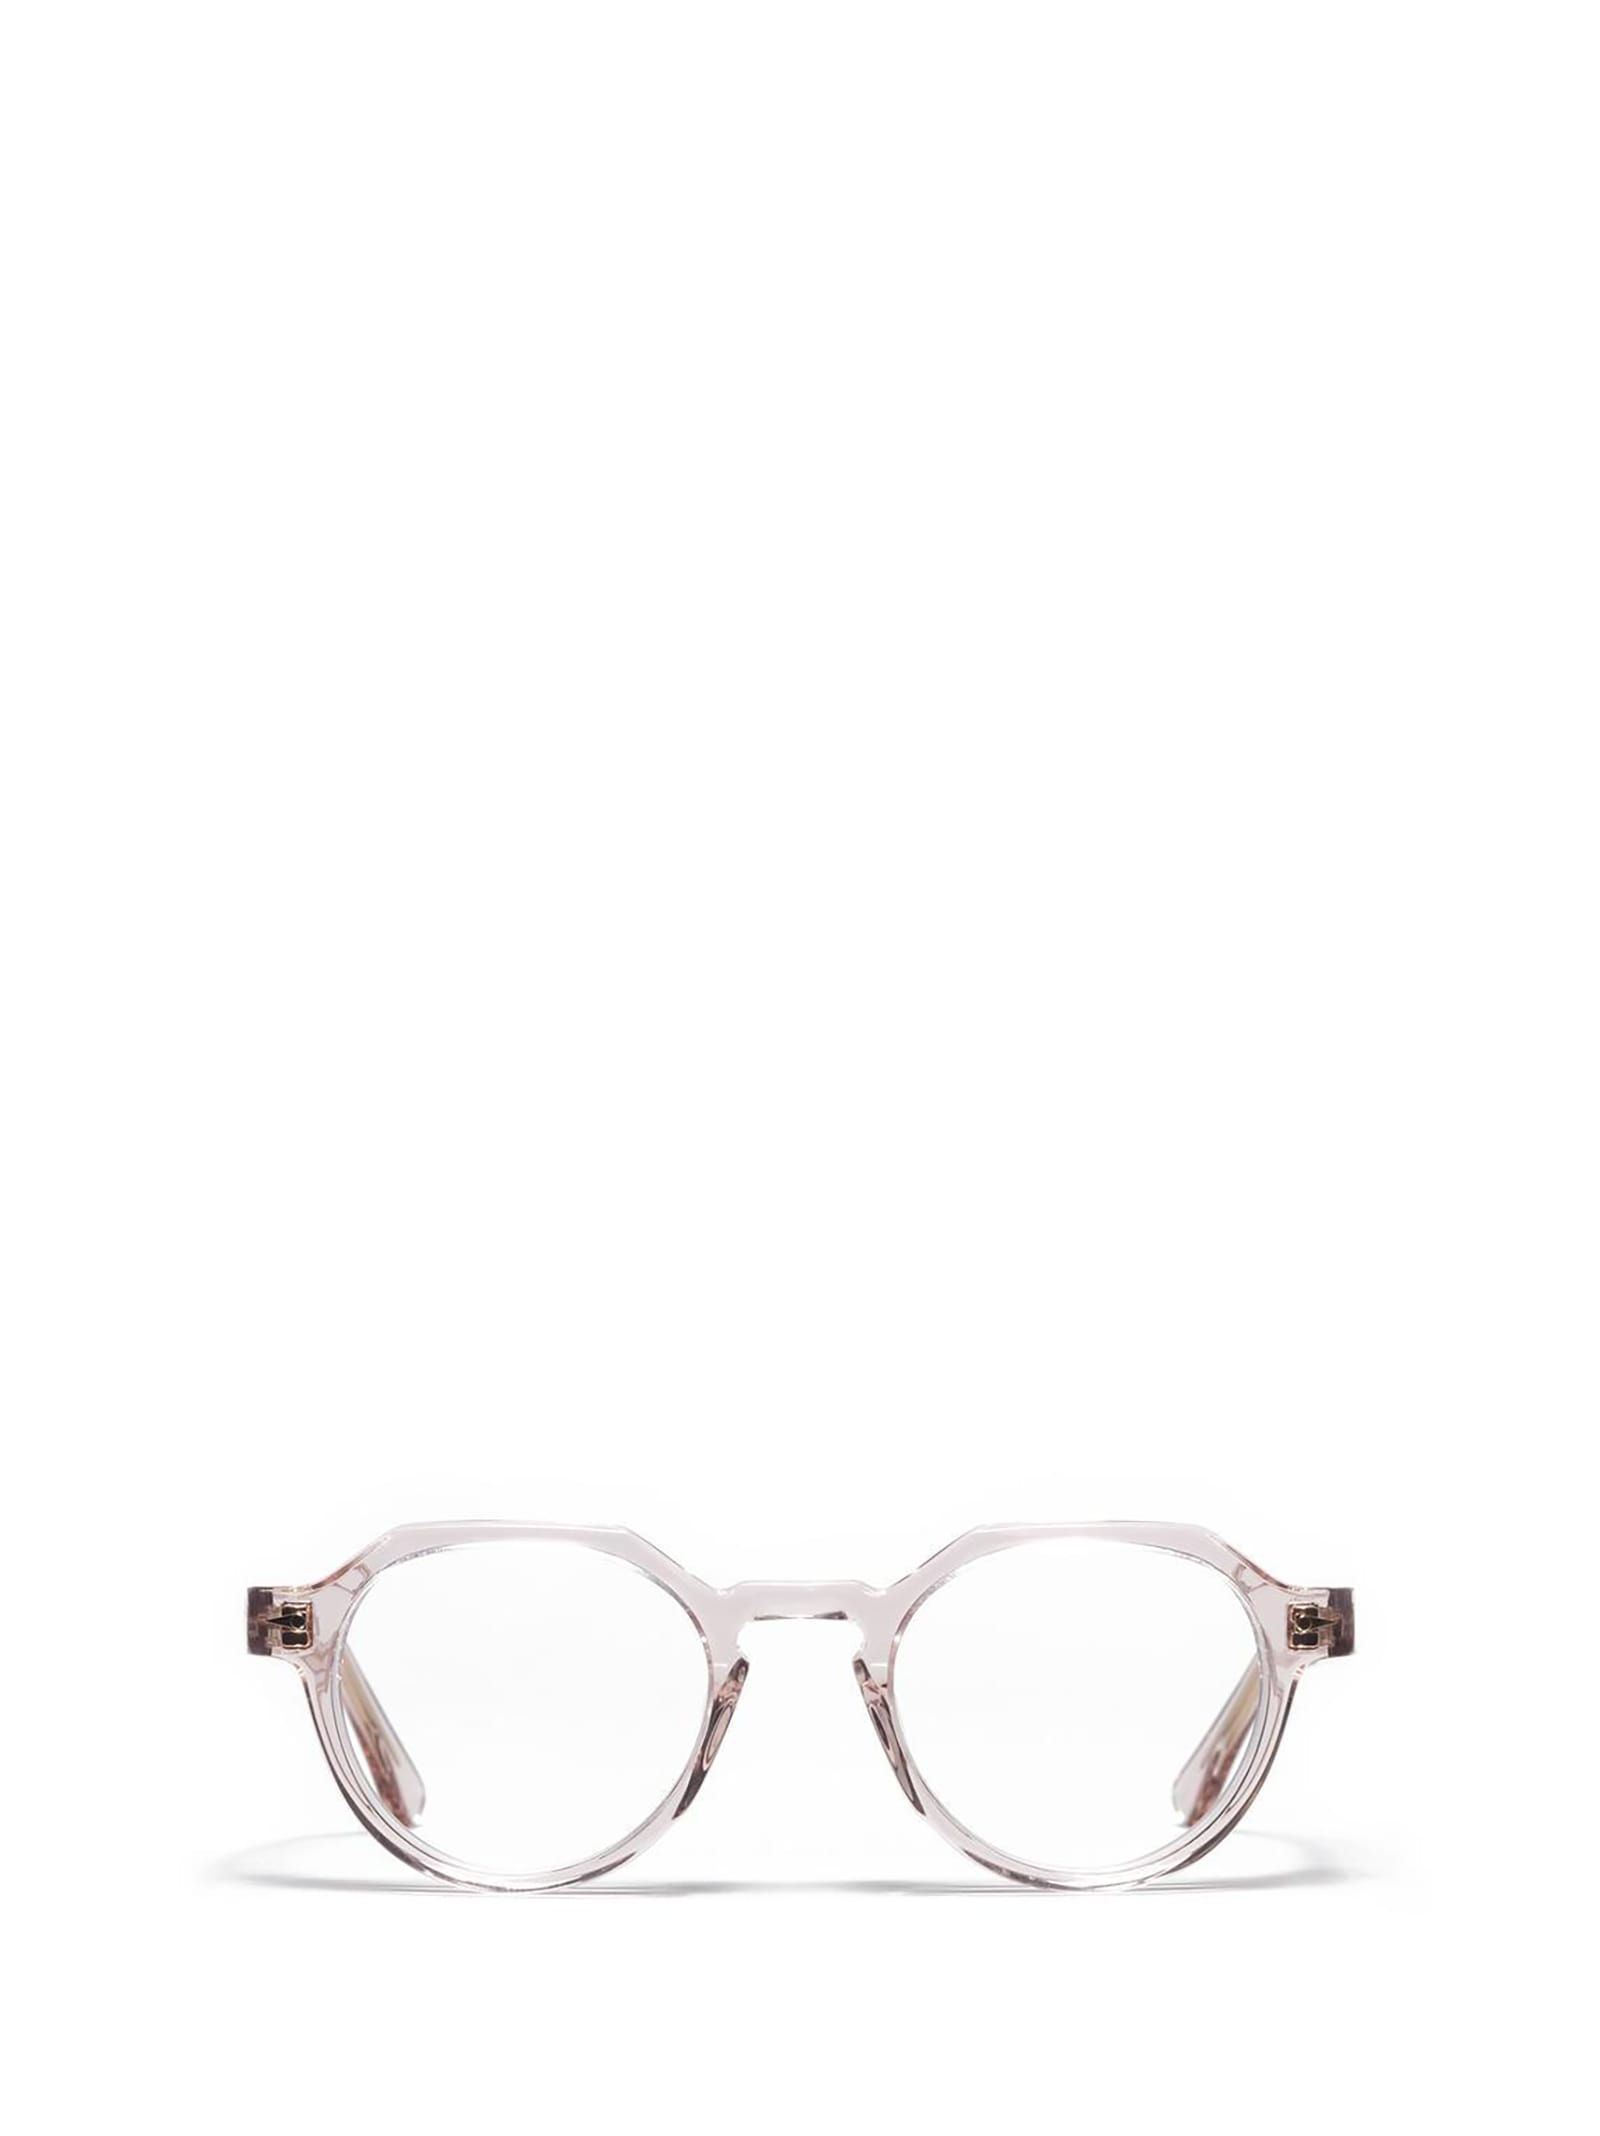 AHLEM Ahlem Rue Bosquet Dustlight Glasses